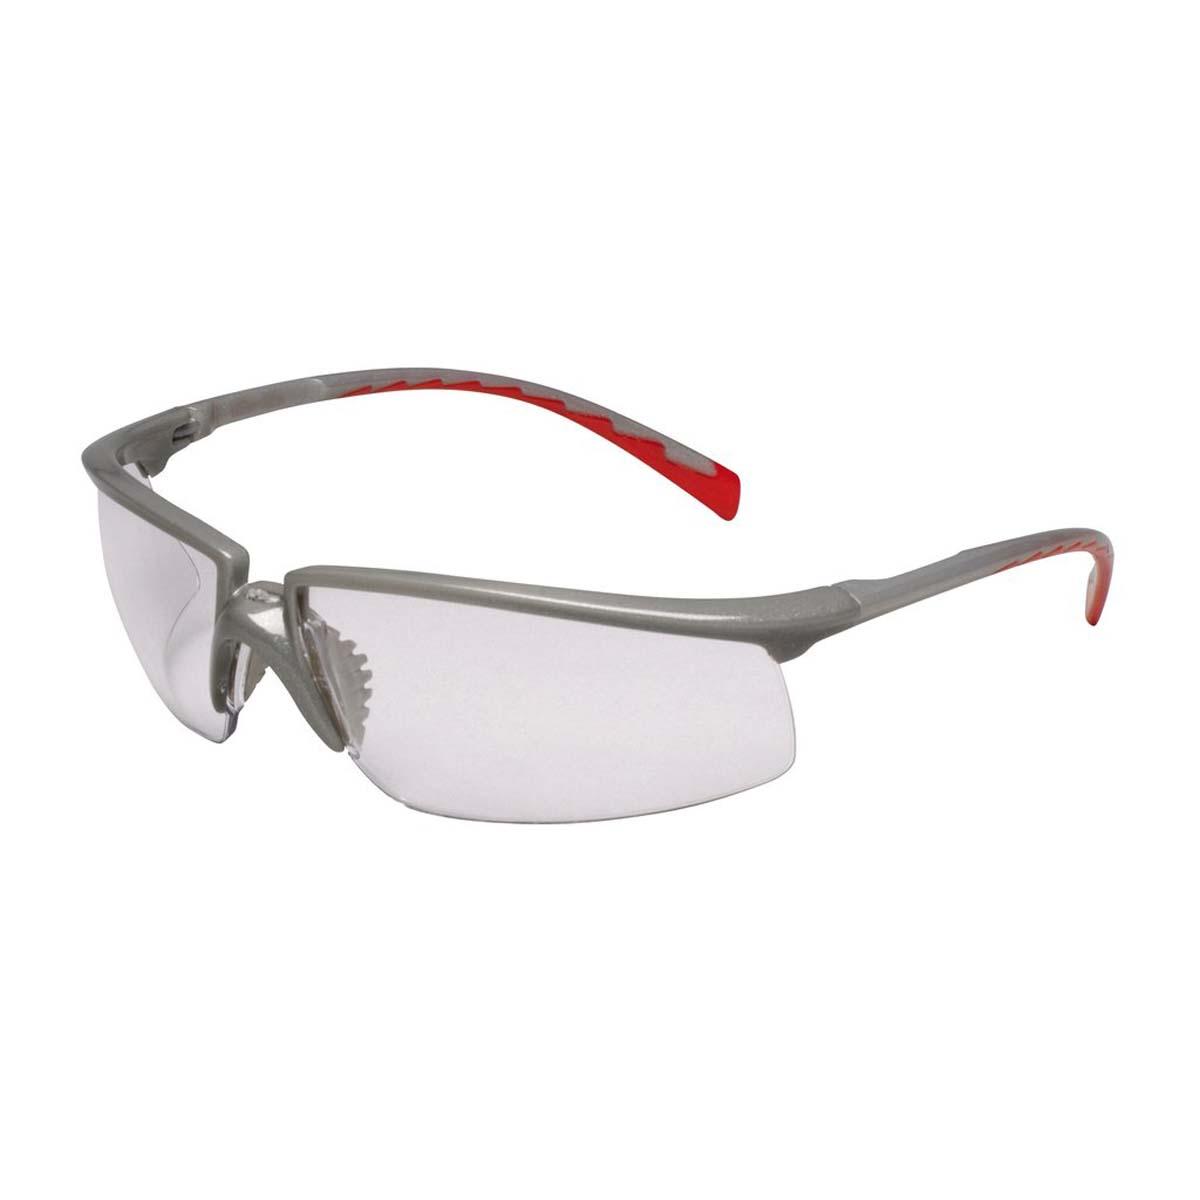 "3Mâ""¢ Privoâ""¢ Protective Eyewear 12265-00000-20 Clear Anti-Fog Lens, Silver Frame"